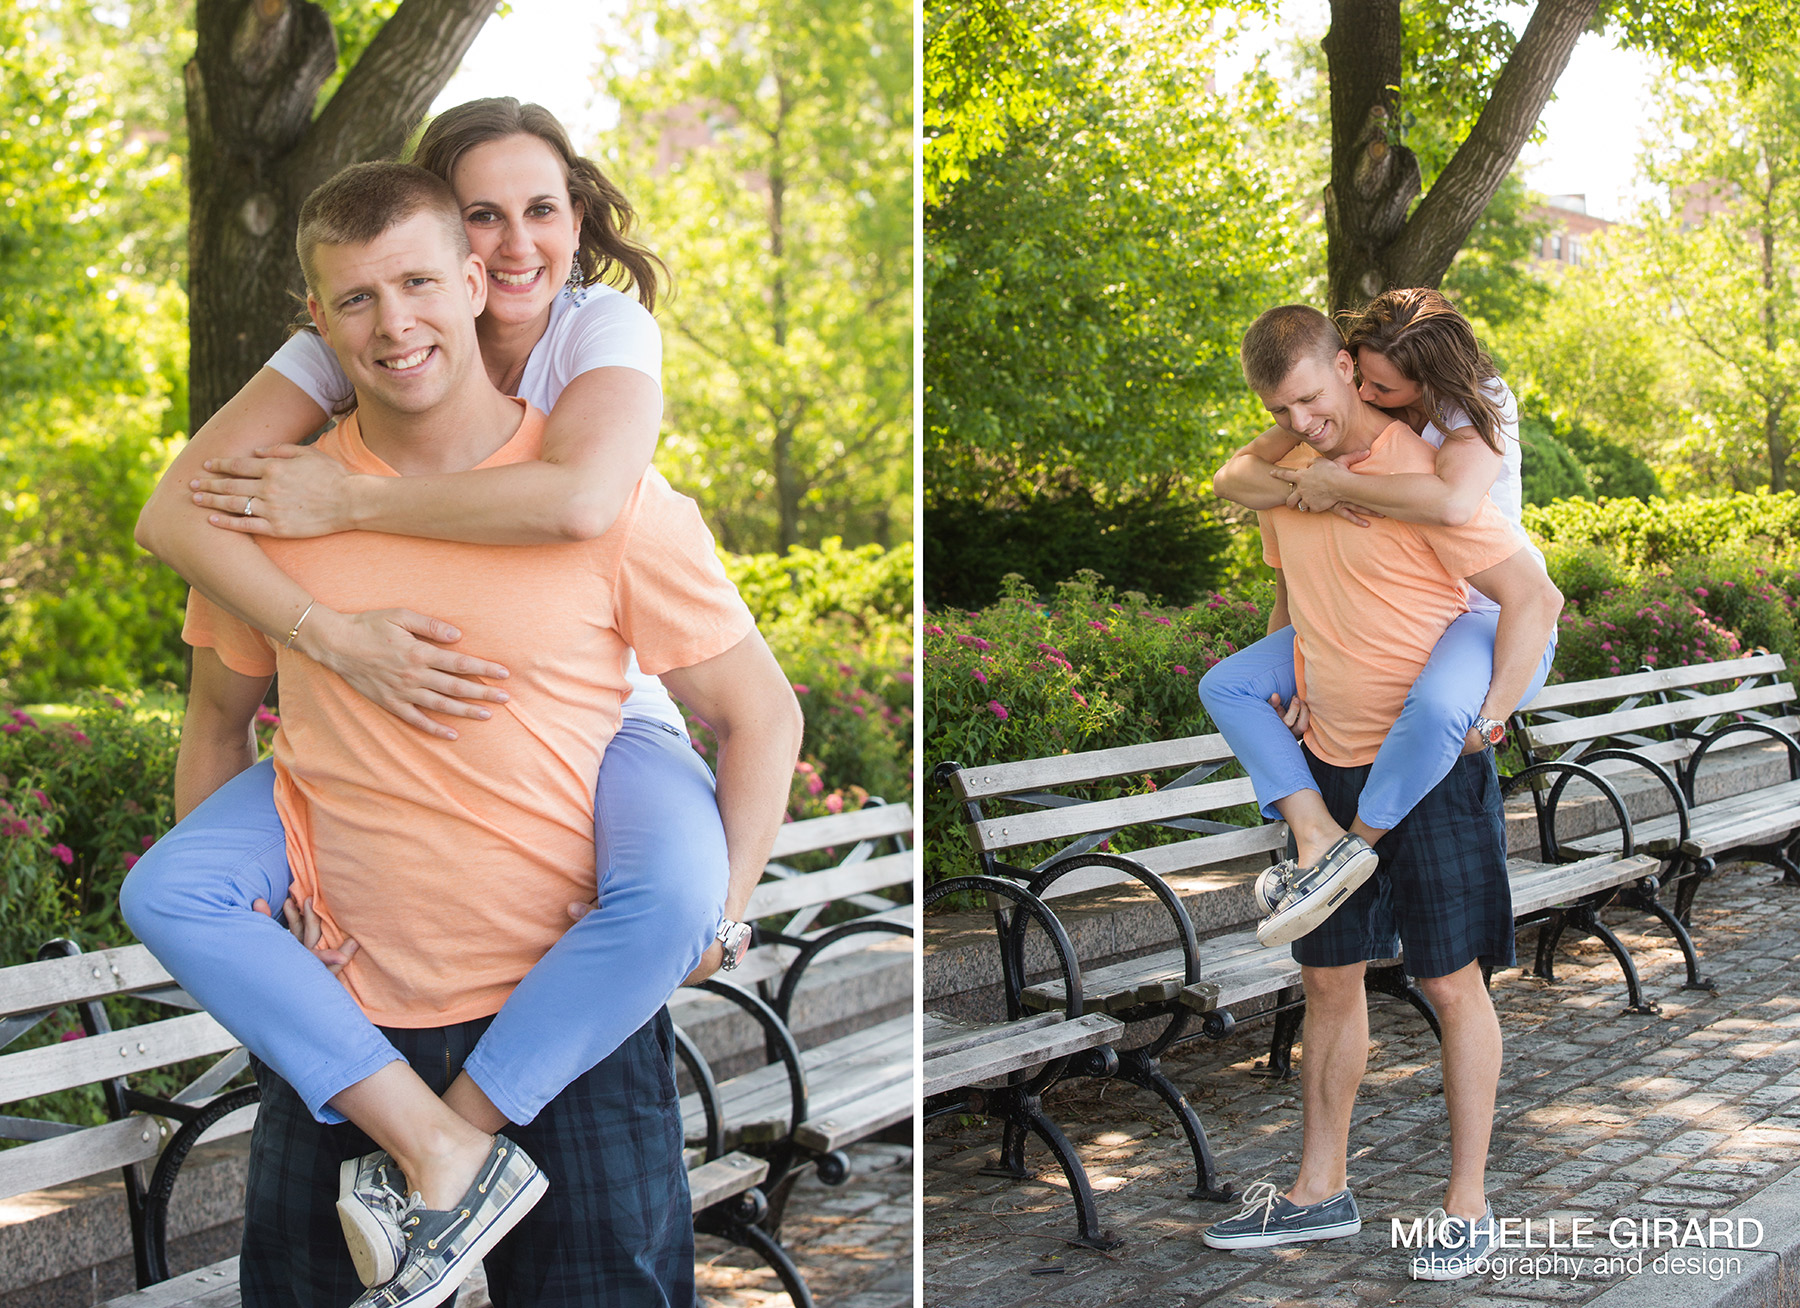 NewYorkCityHighLineEngagementSession_MichelleGirardPhotography19.jpg